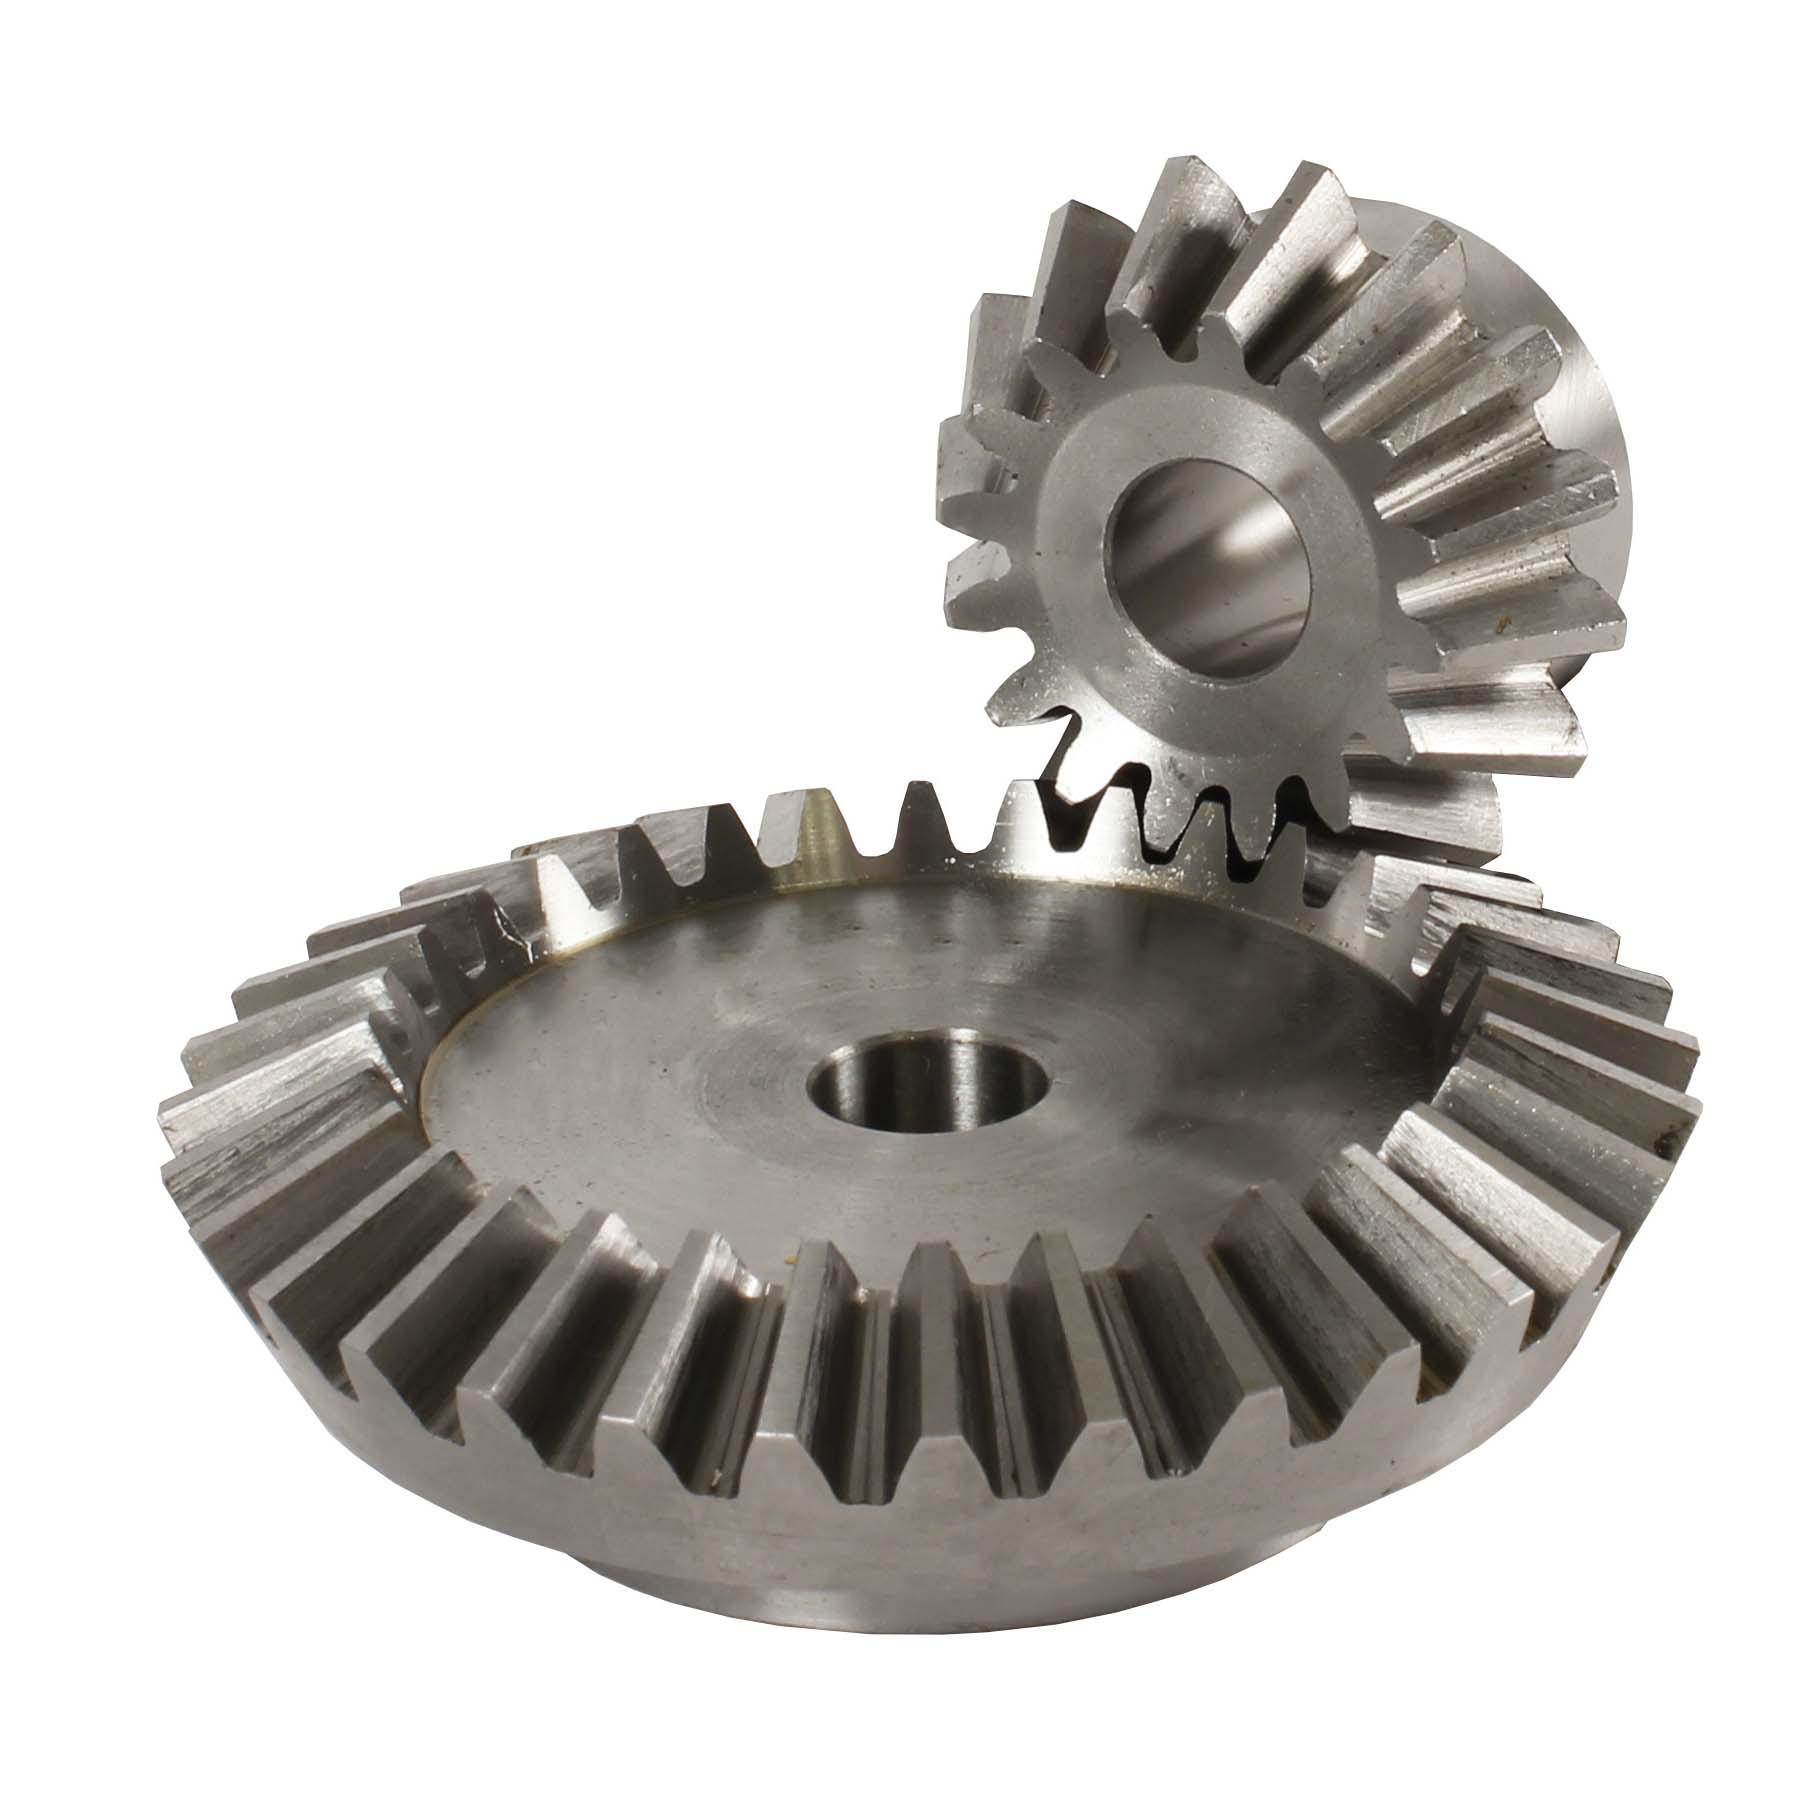 Bevel gear - Steel C43 - 2:1 - 1.50 - Economy range